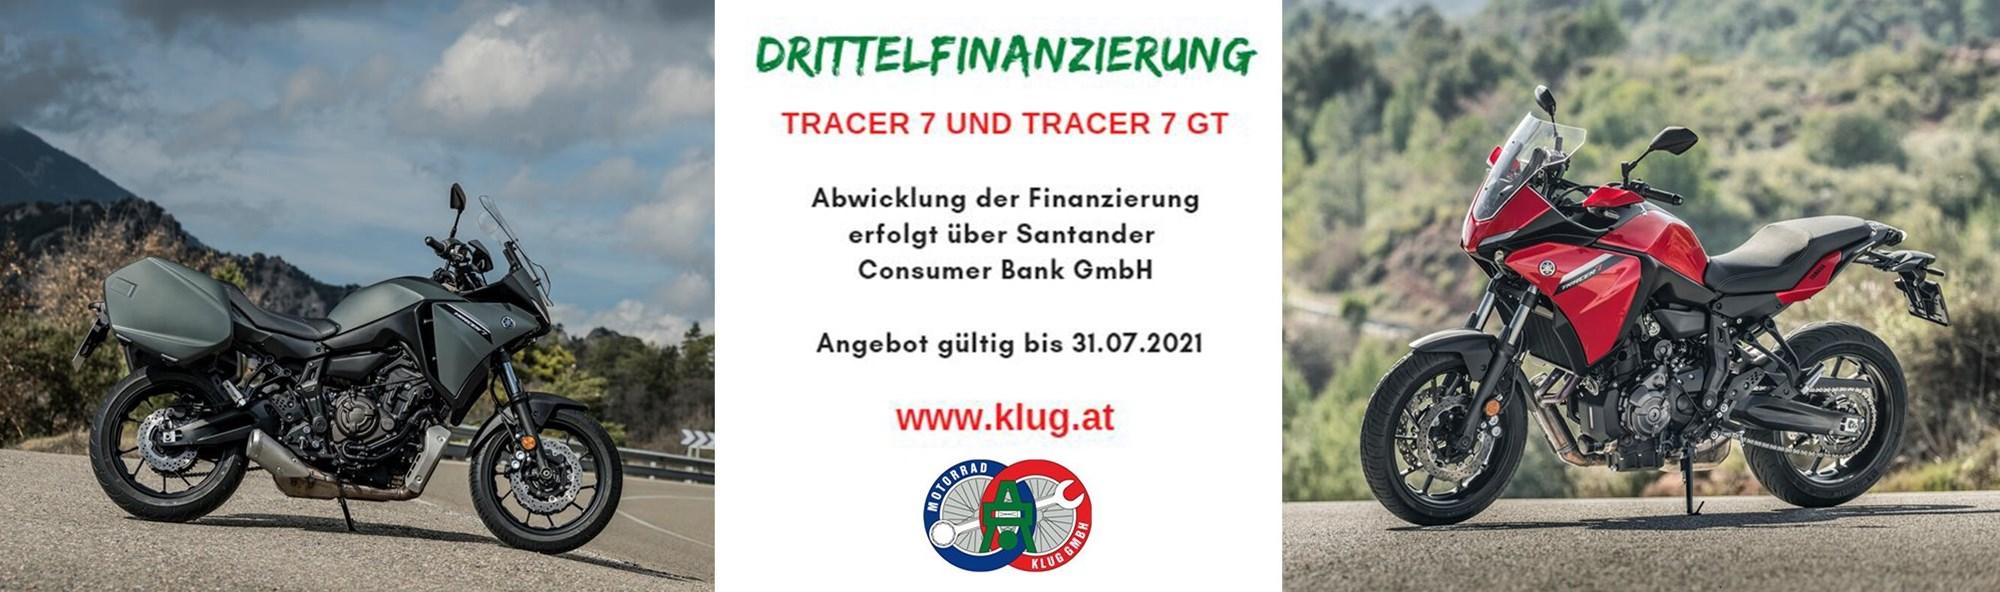 Finanzierung Tracer 7 & Tracer 7 GT